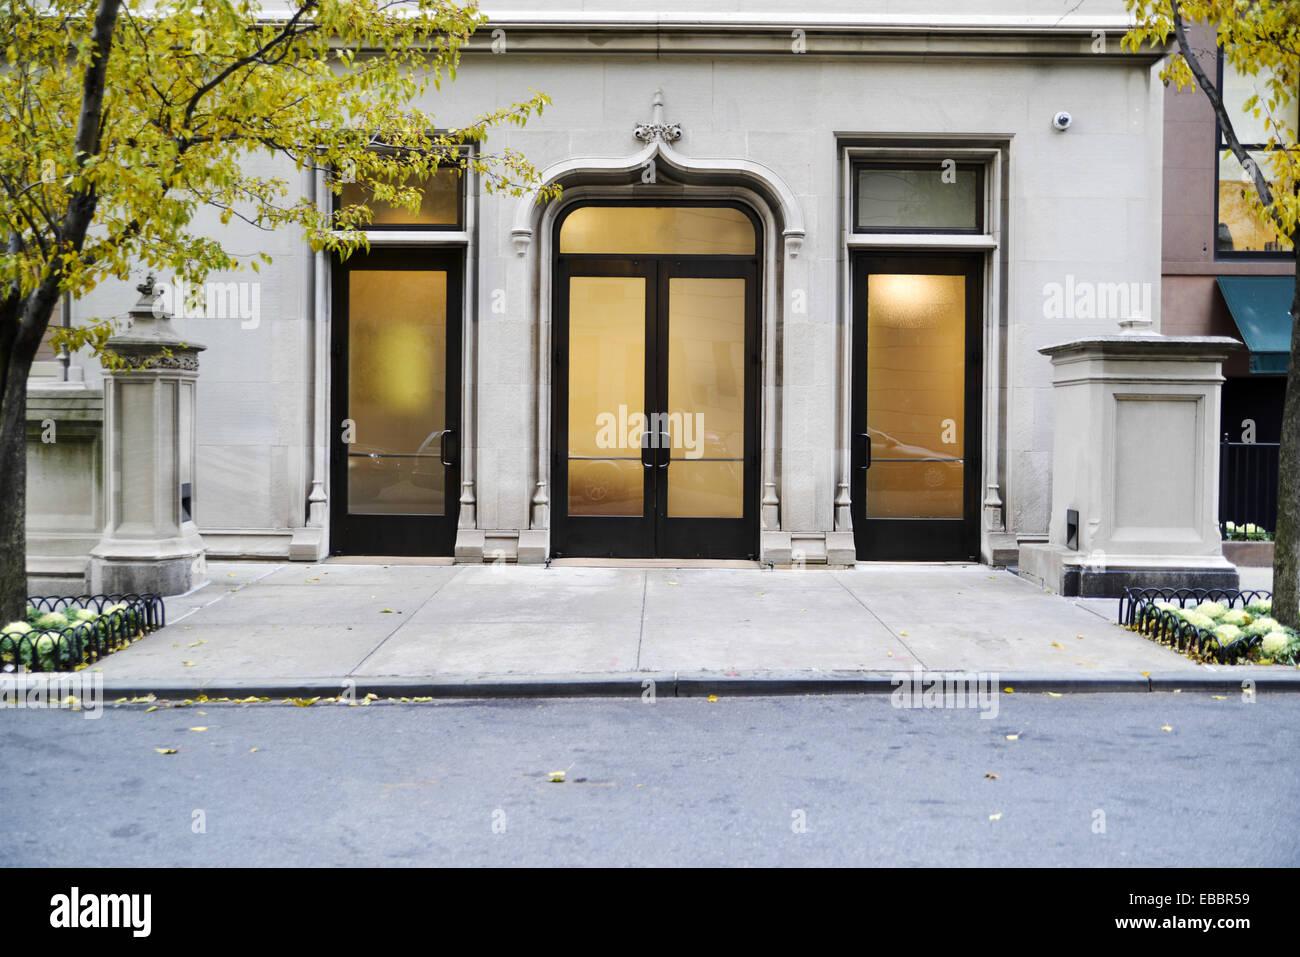 Soft Light Seen Through the Doors of a Townhouse Manhattan New York City. - Stock Image